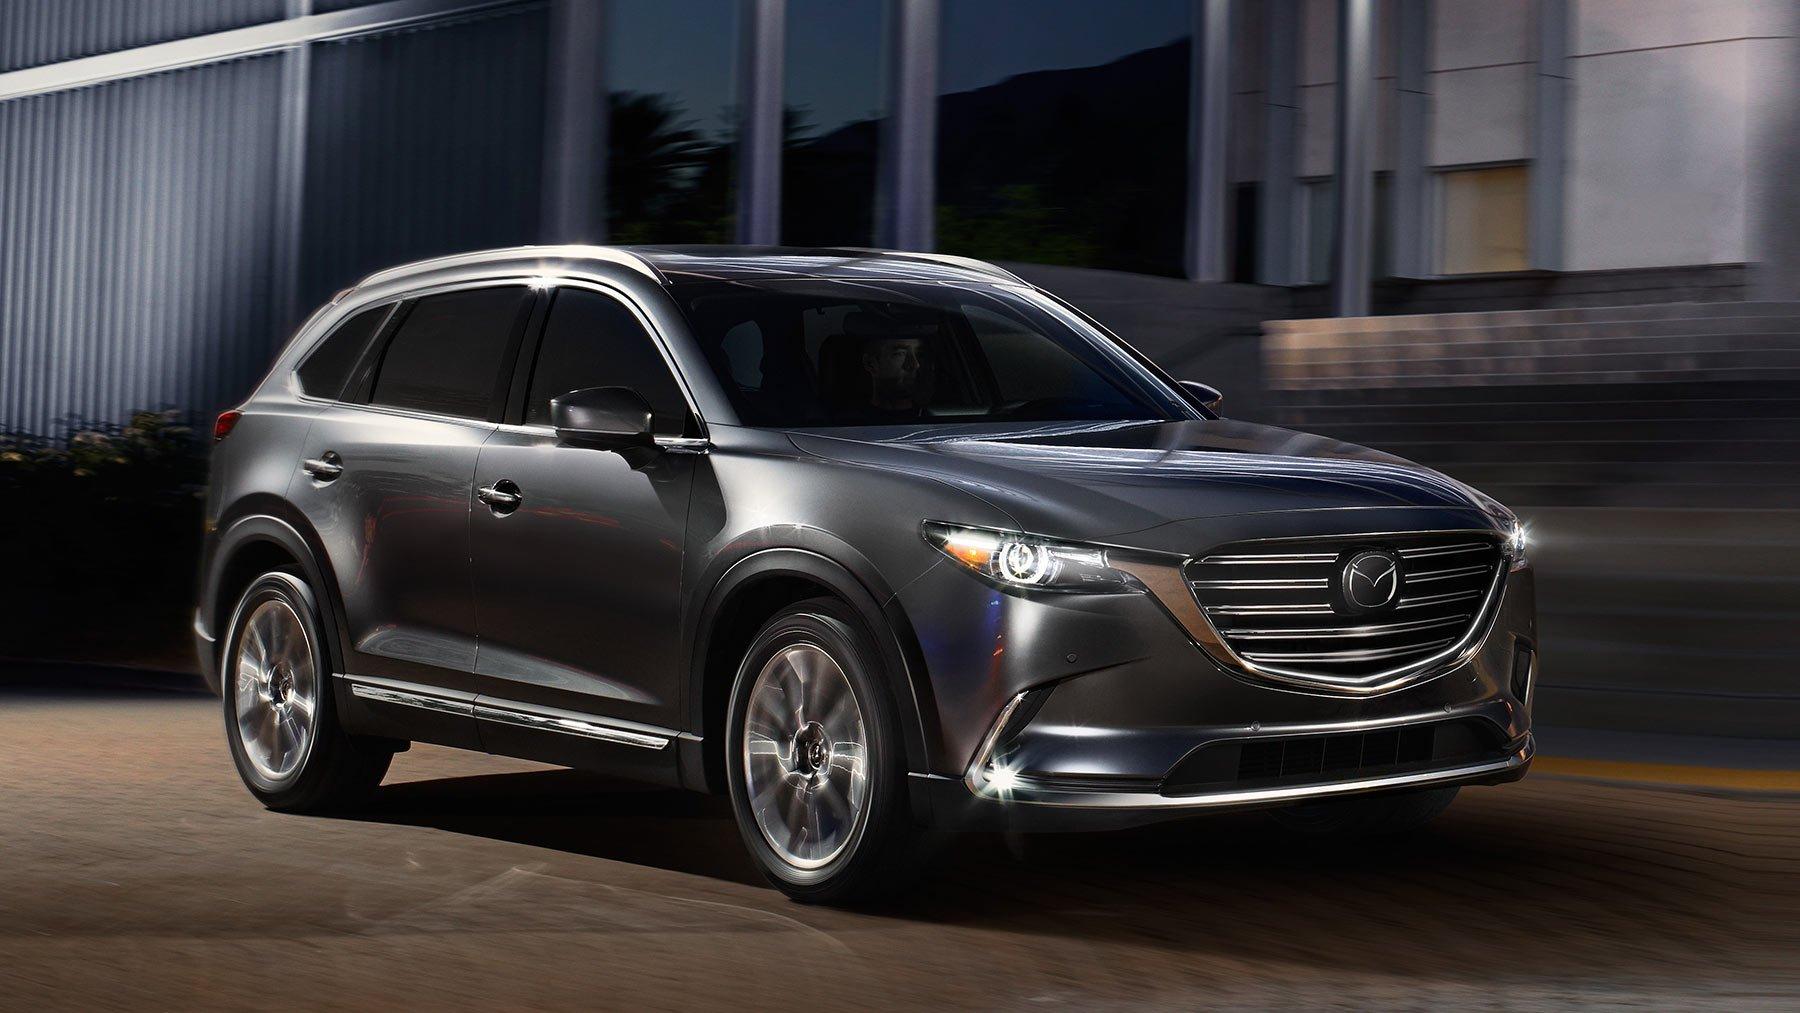 New Mazda CX 9 Exterior Features